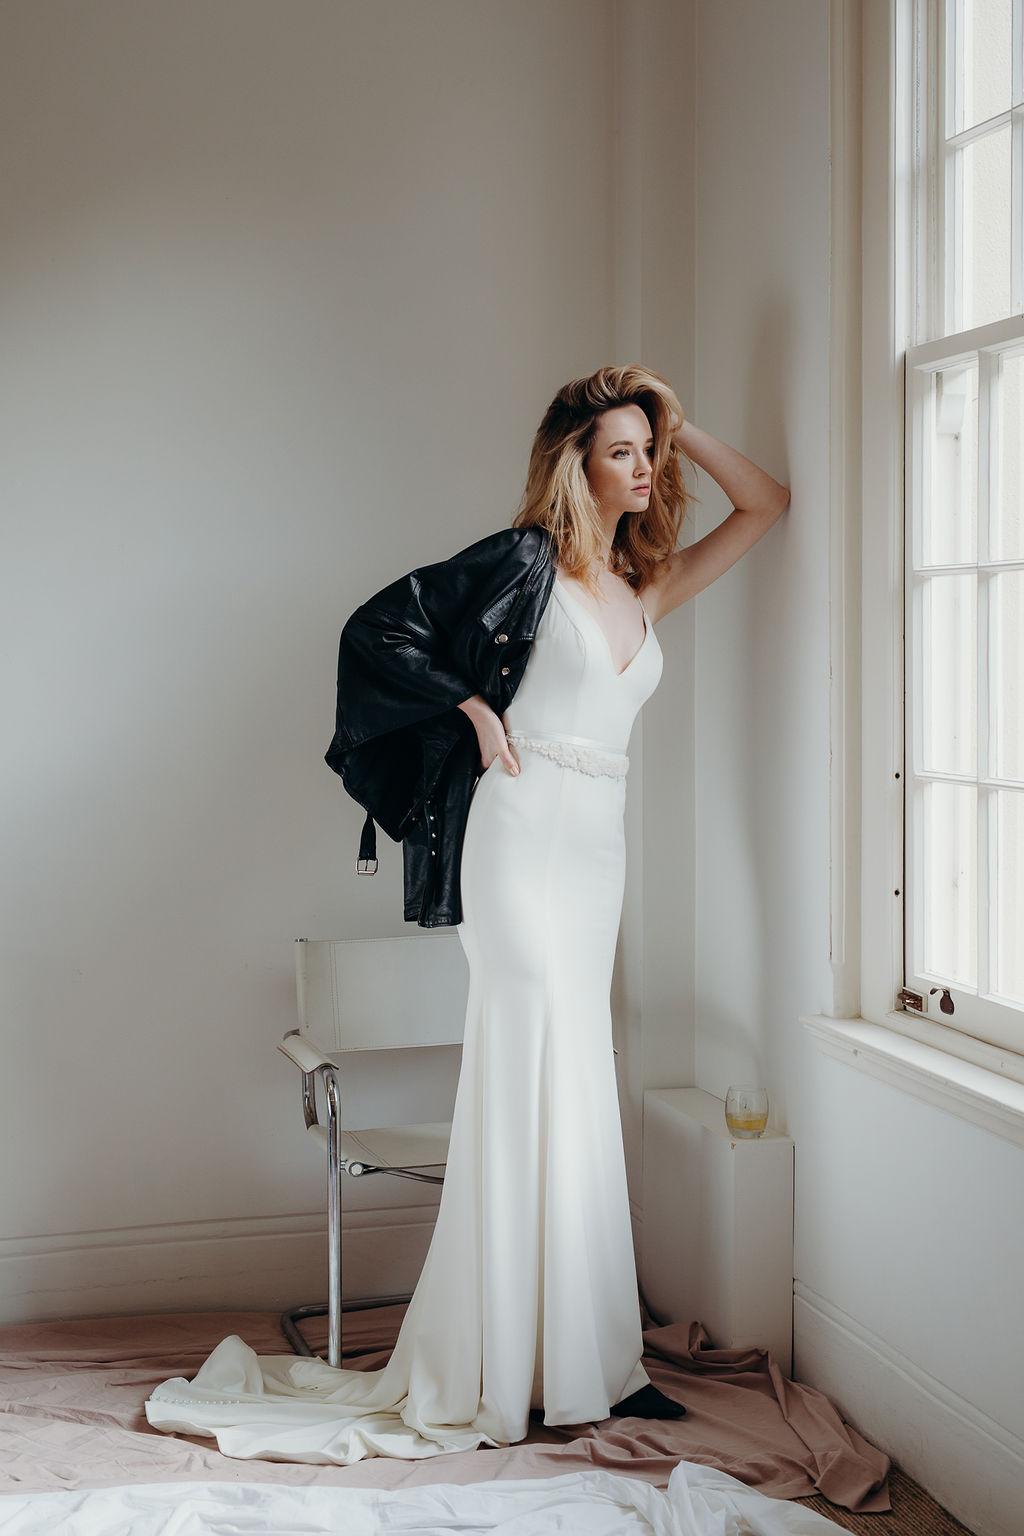 Daisy Brides Bridal Designer available to brides in Queensland at Bohemian Brides